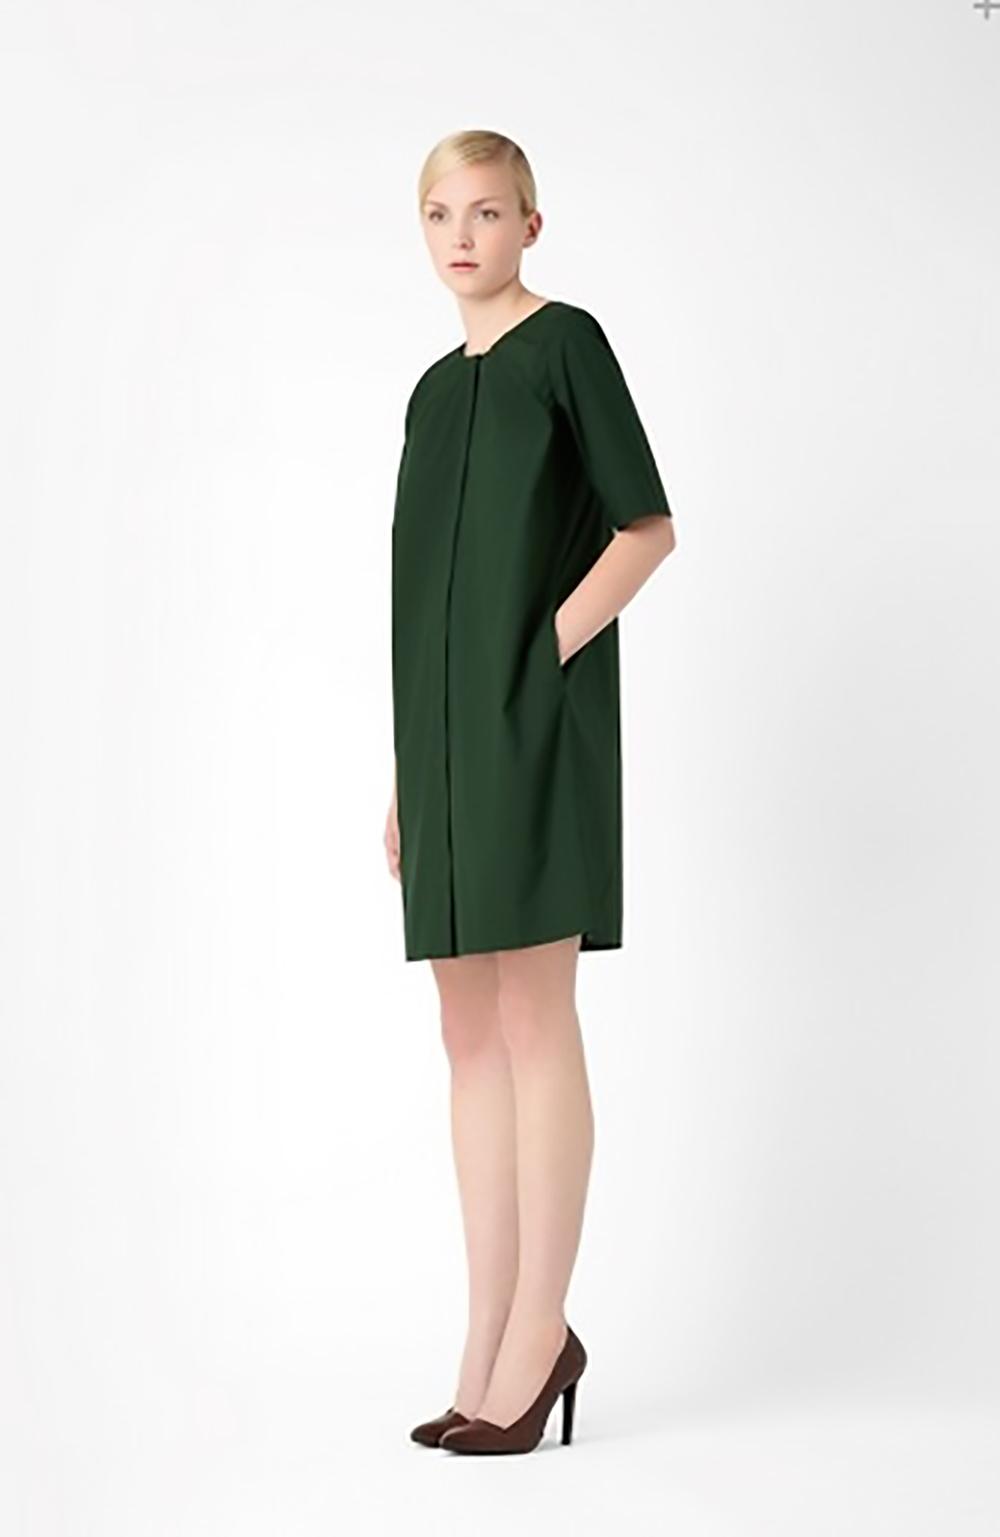 cos pleated neckline dress COS 1500.jpg